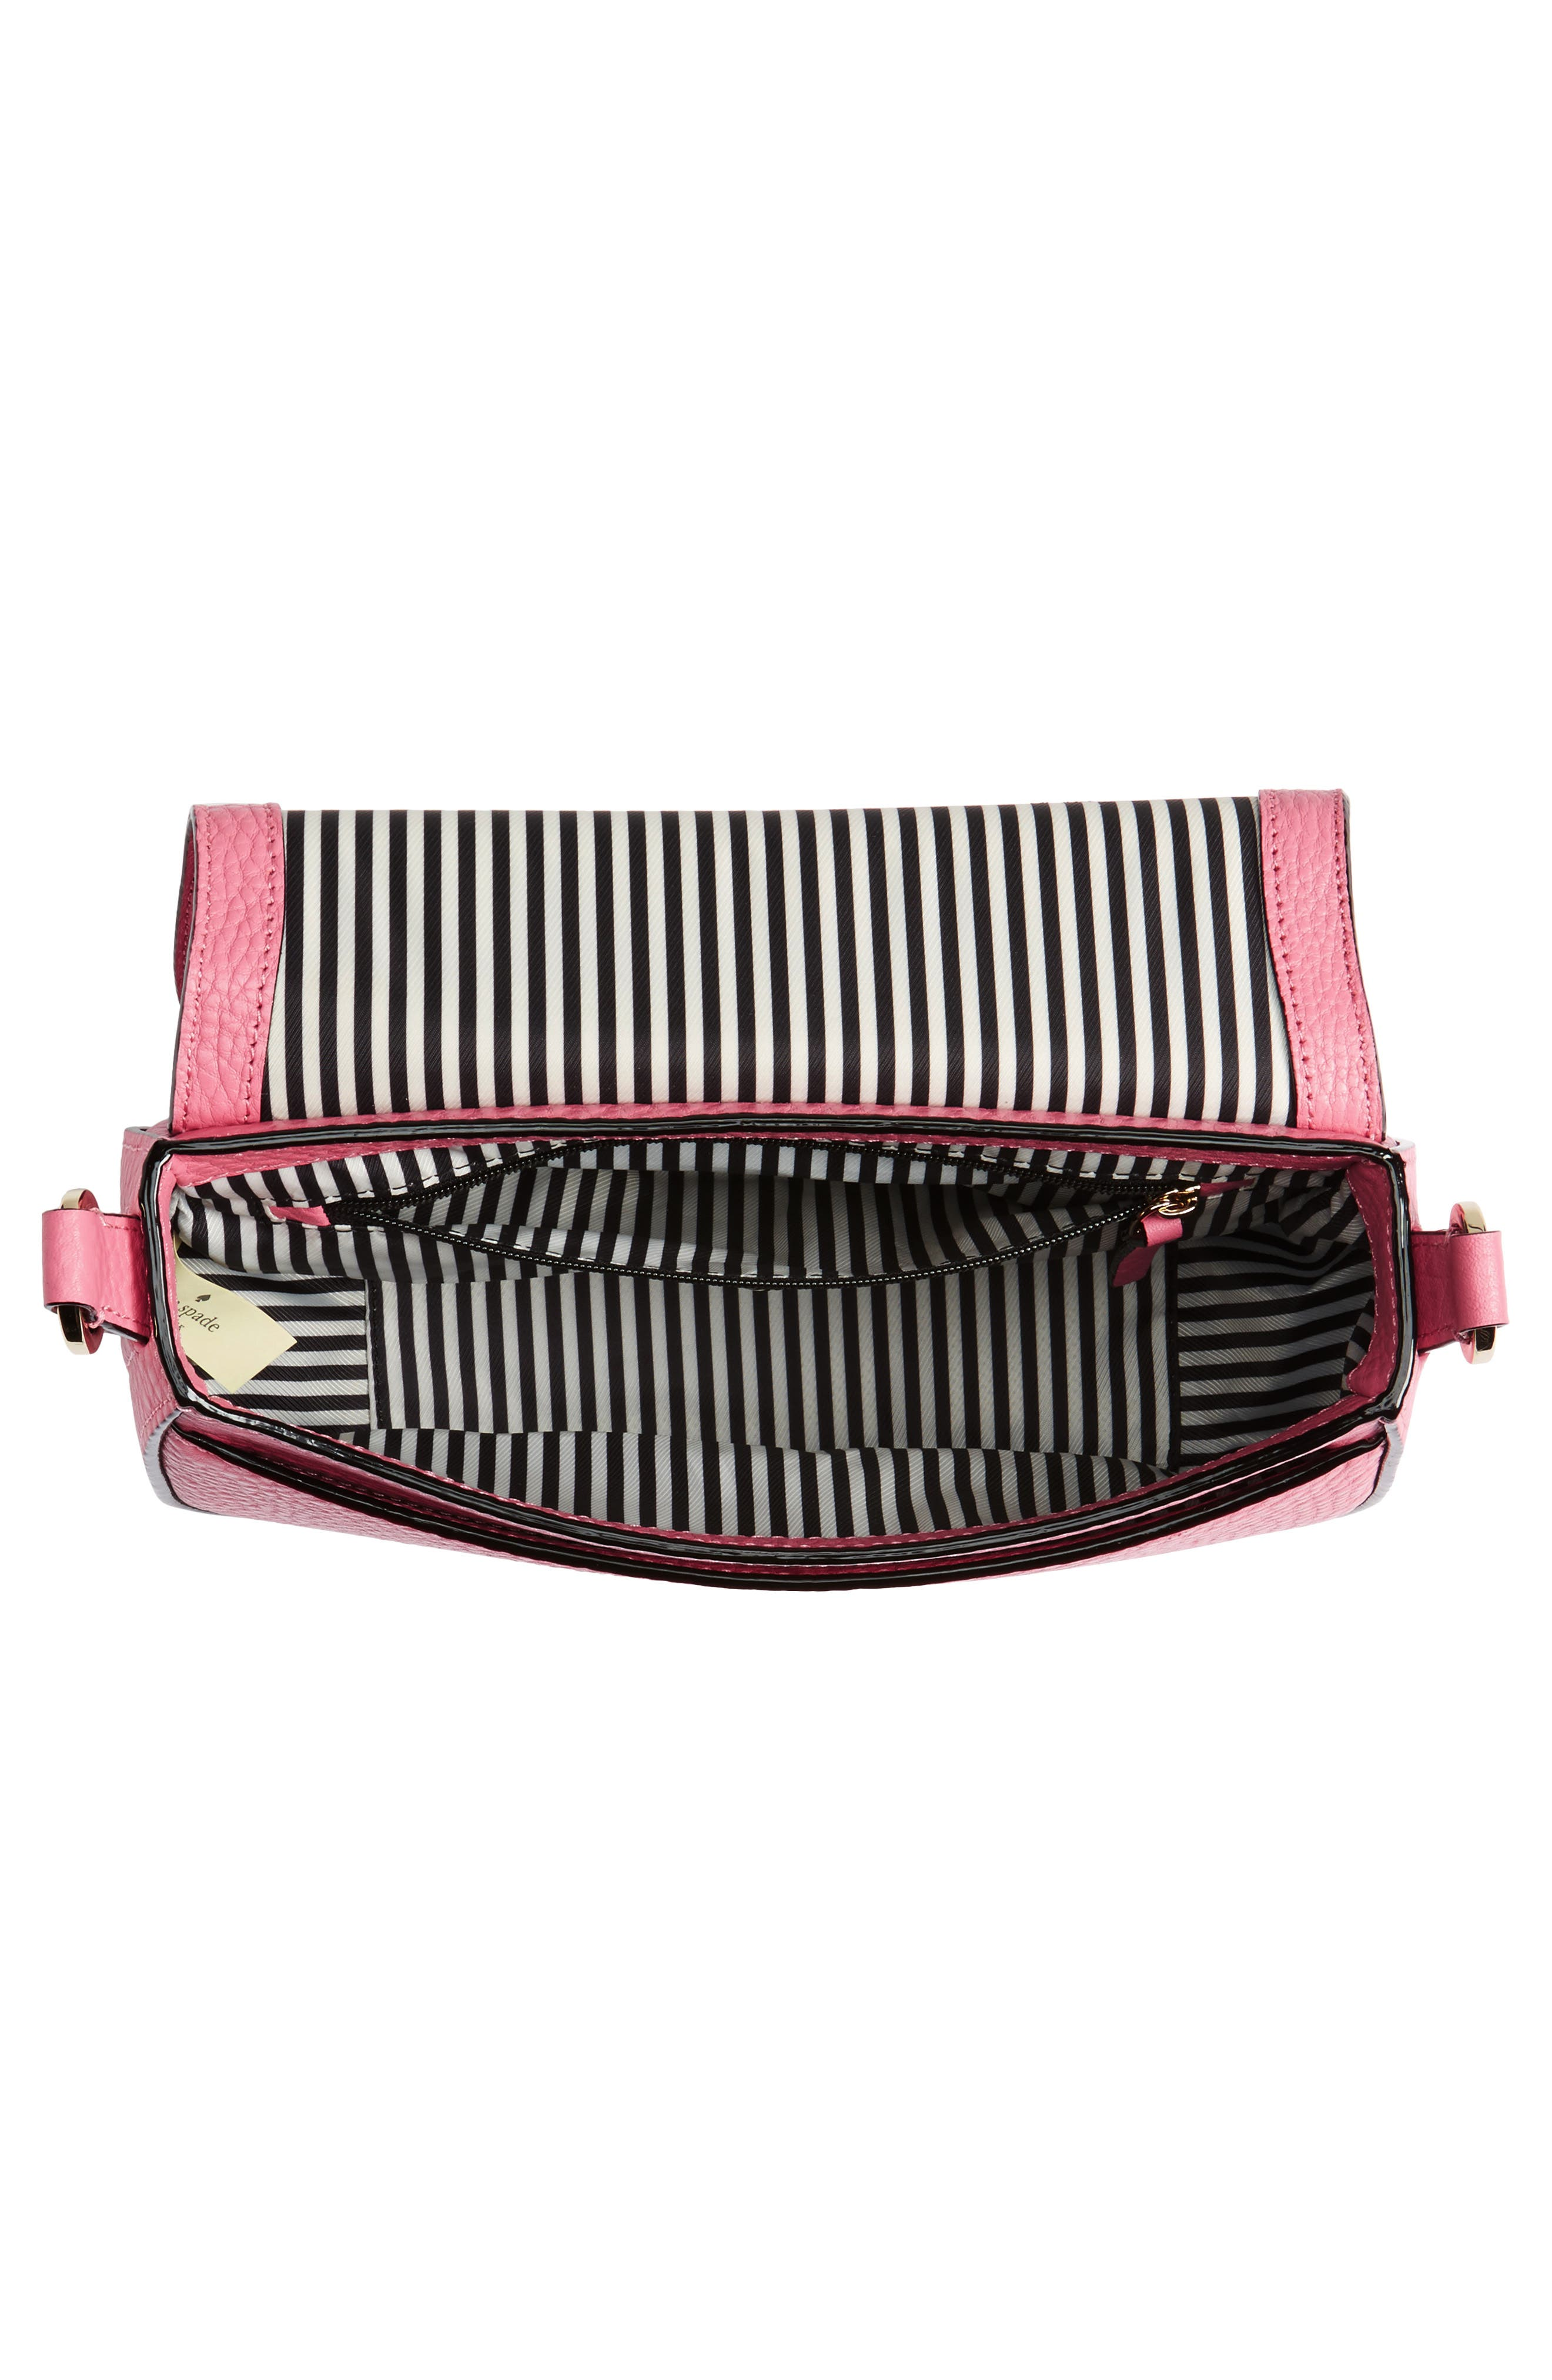 carlyle street - kallie leather saddle bag,                             Alternate thumbnail 4, color,                             Pink Sunset